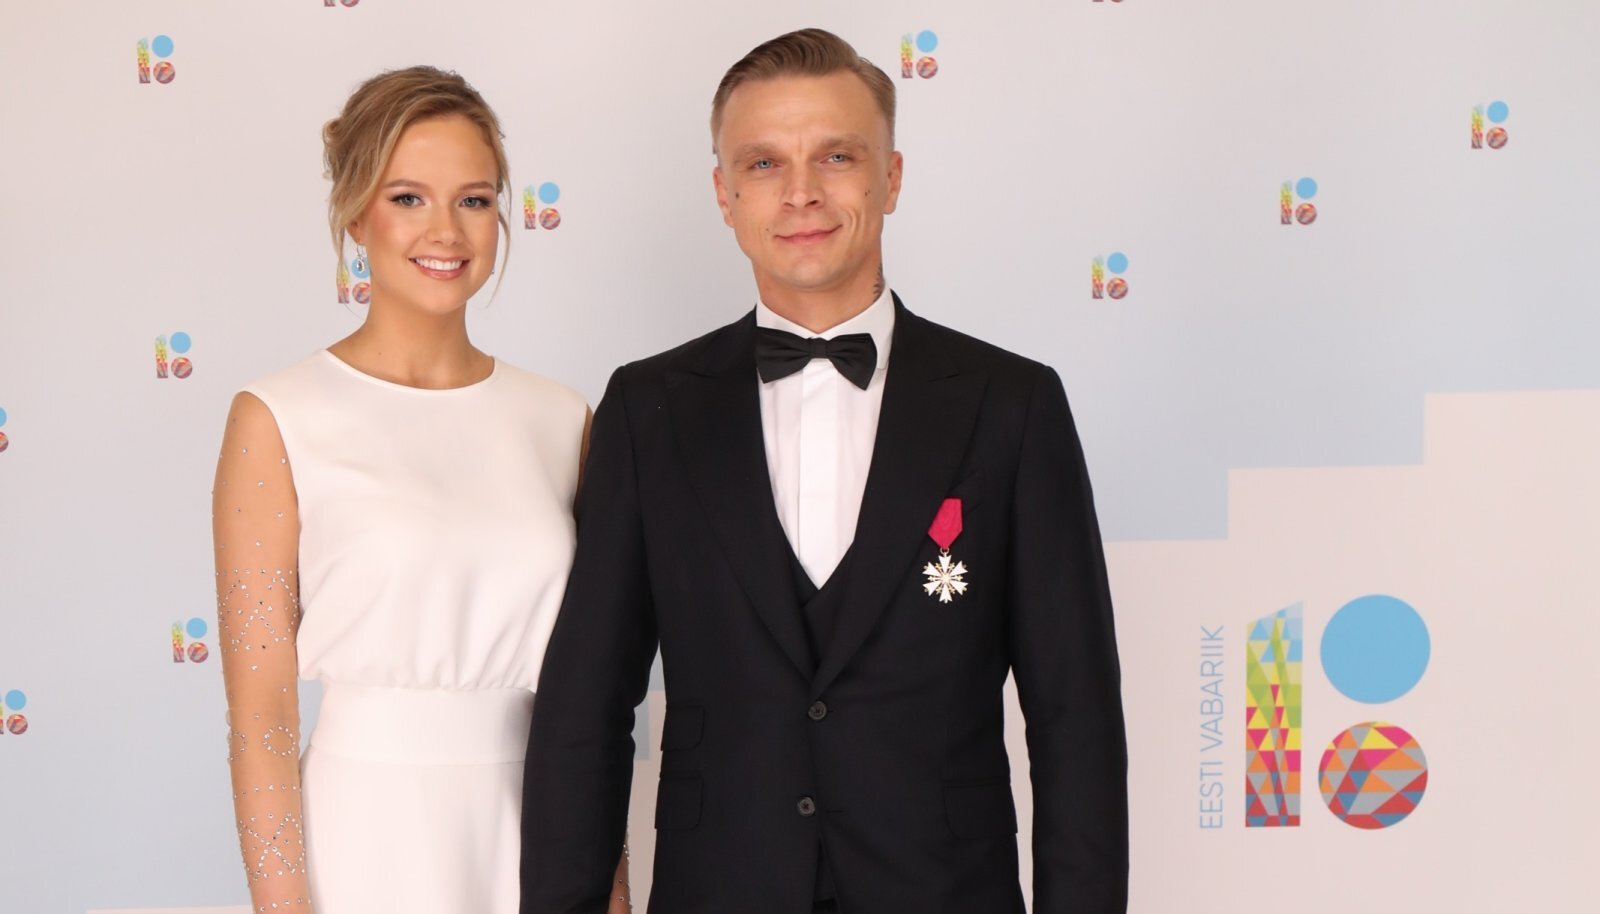 Lauren Villmann ja Tanel Padar